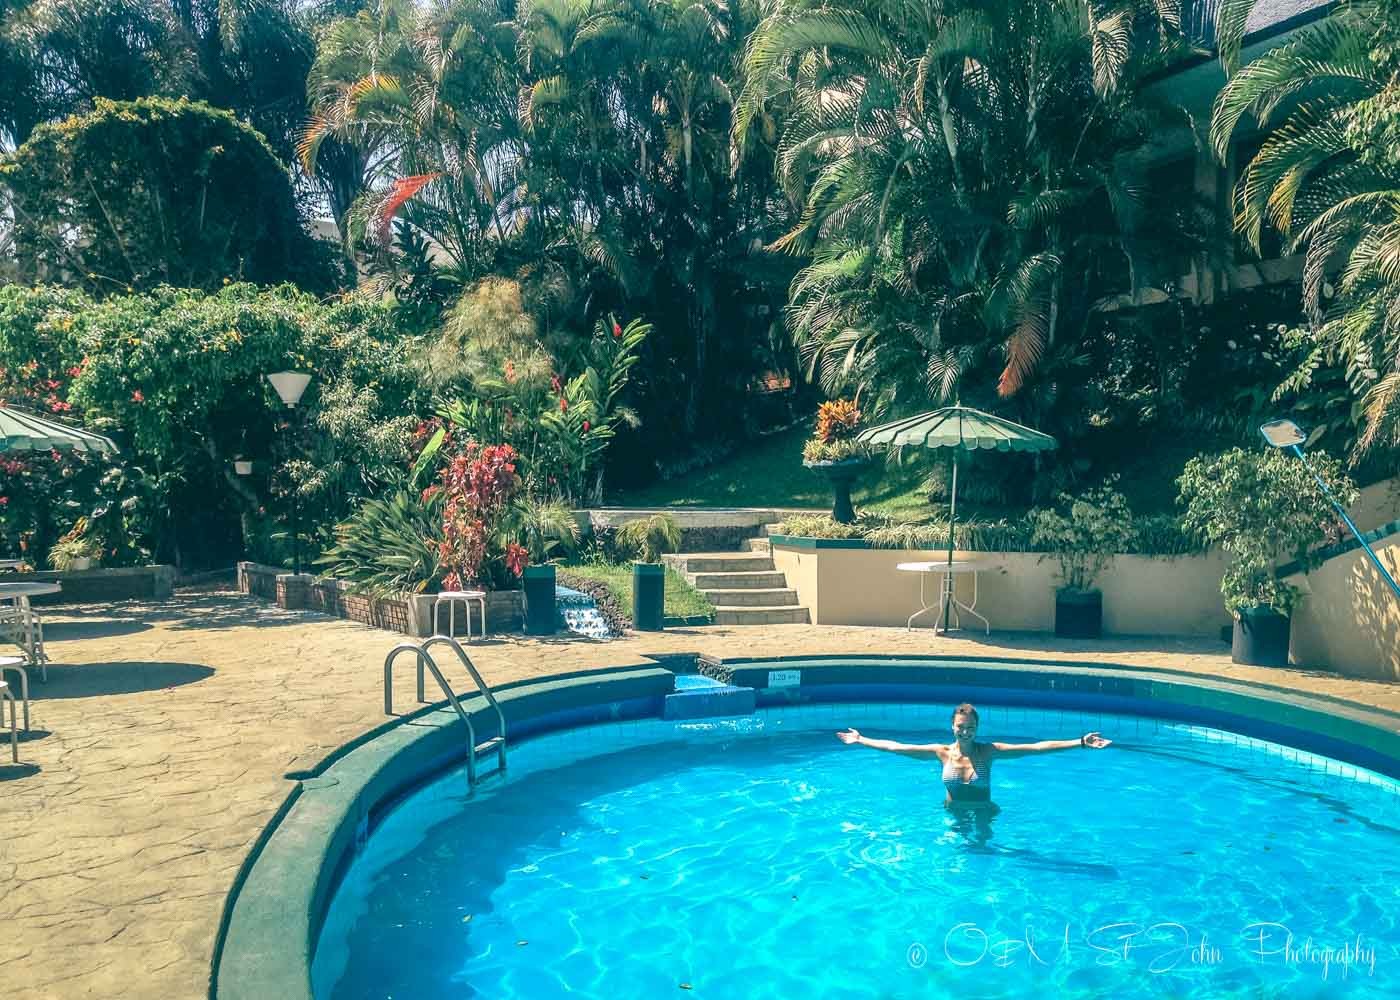 Oksana in the pool in San Jose, Costa Rica